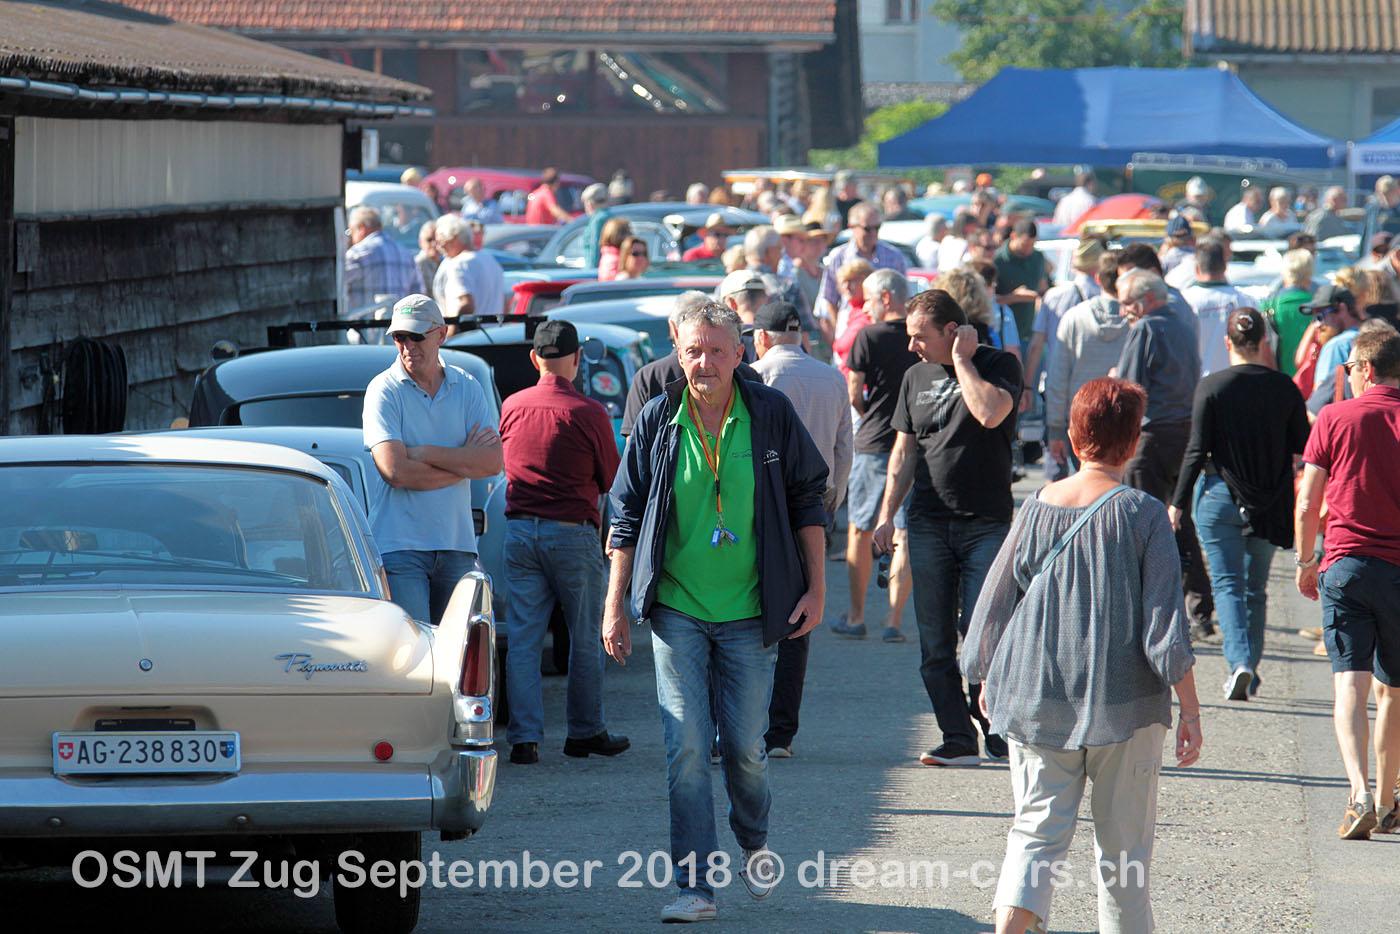 OSMT Zug September 2018